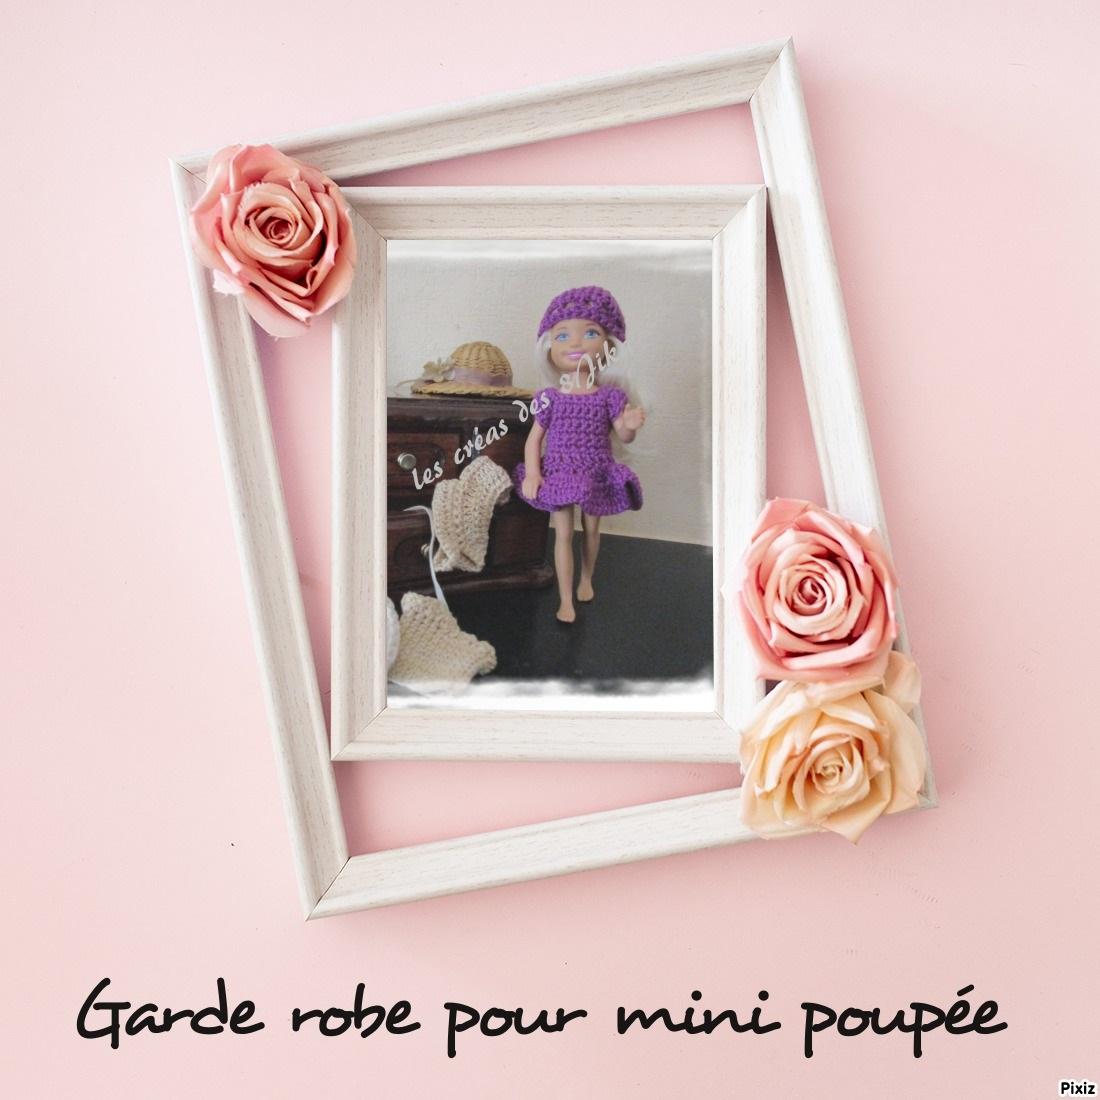 Ma garde robe pour mini poupées